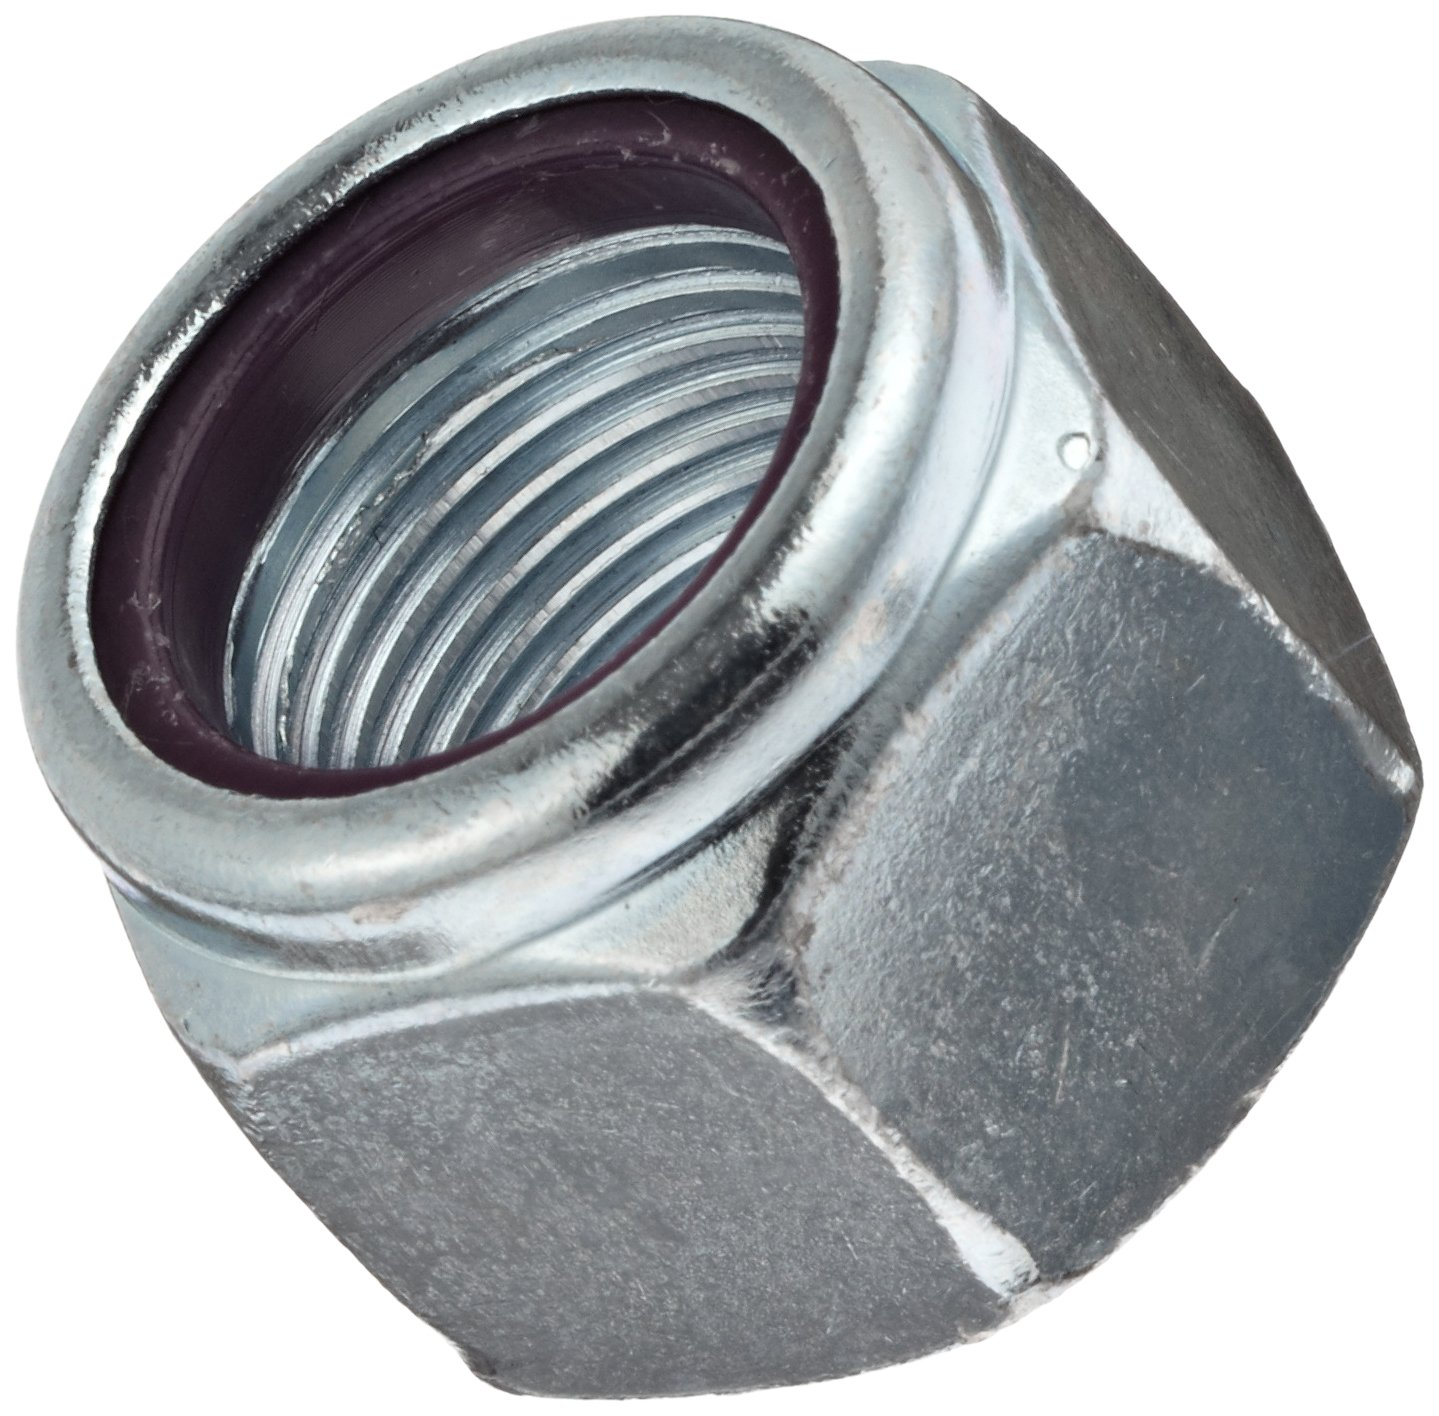 Self-Locking Nylon Insert Steel Hex Nut 5//8-18 Threads Right Hand Threads Grade 5 1.051 Width Across Flats Zinc Plated Finish Pack of 25